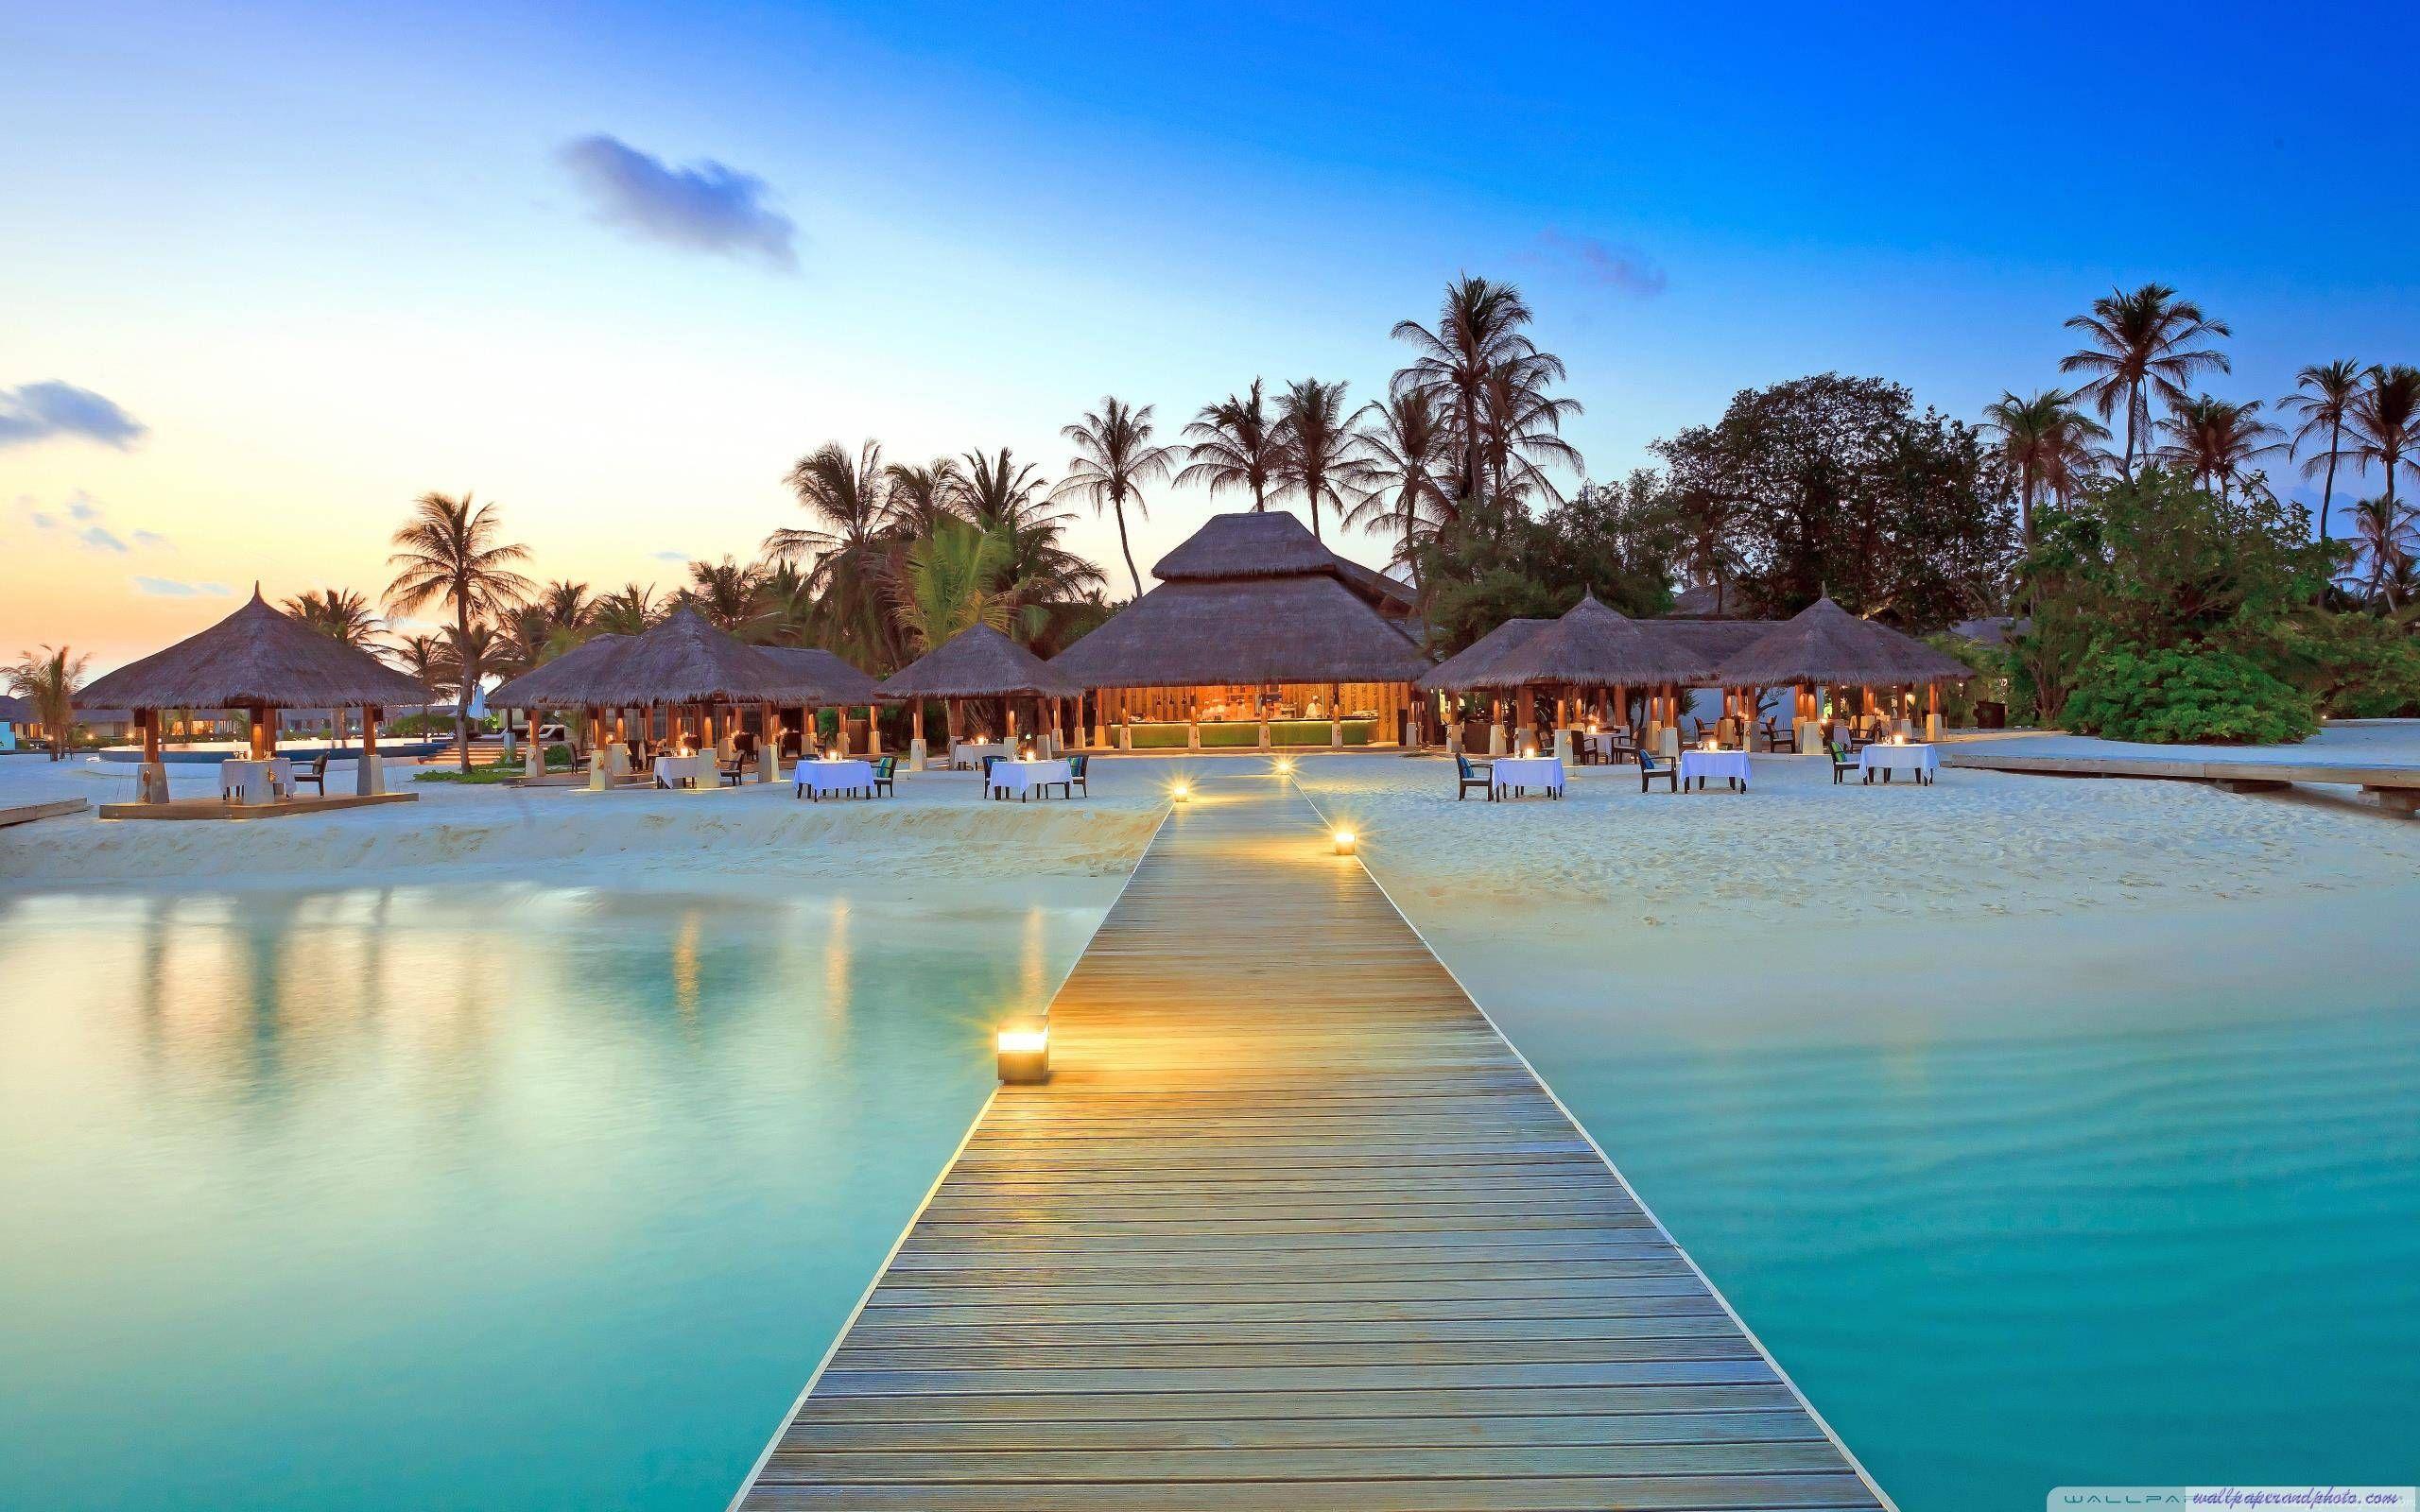 Maldive Islands Resort Hd 16 9 16 10 Desktop Wallpaper Widescreen High Beach Wallpaper Island Resort Maldives Resort